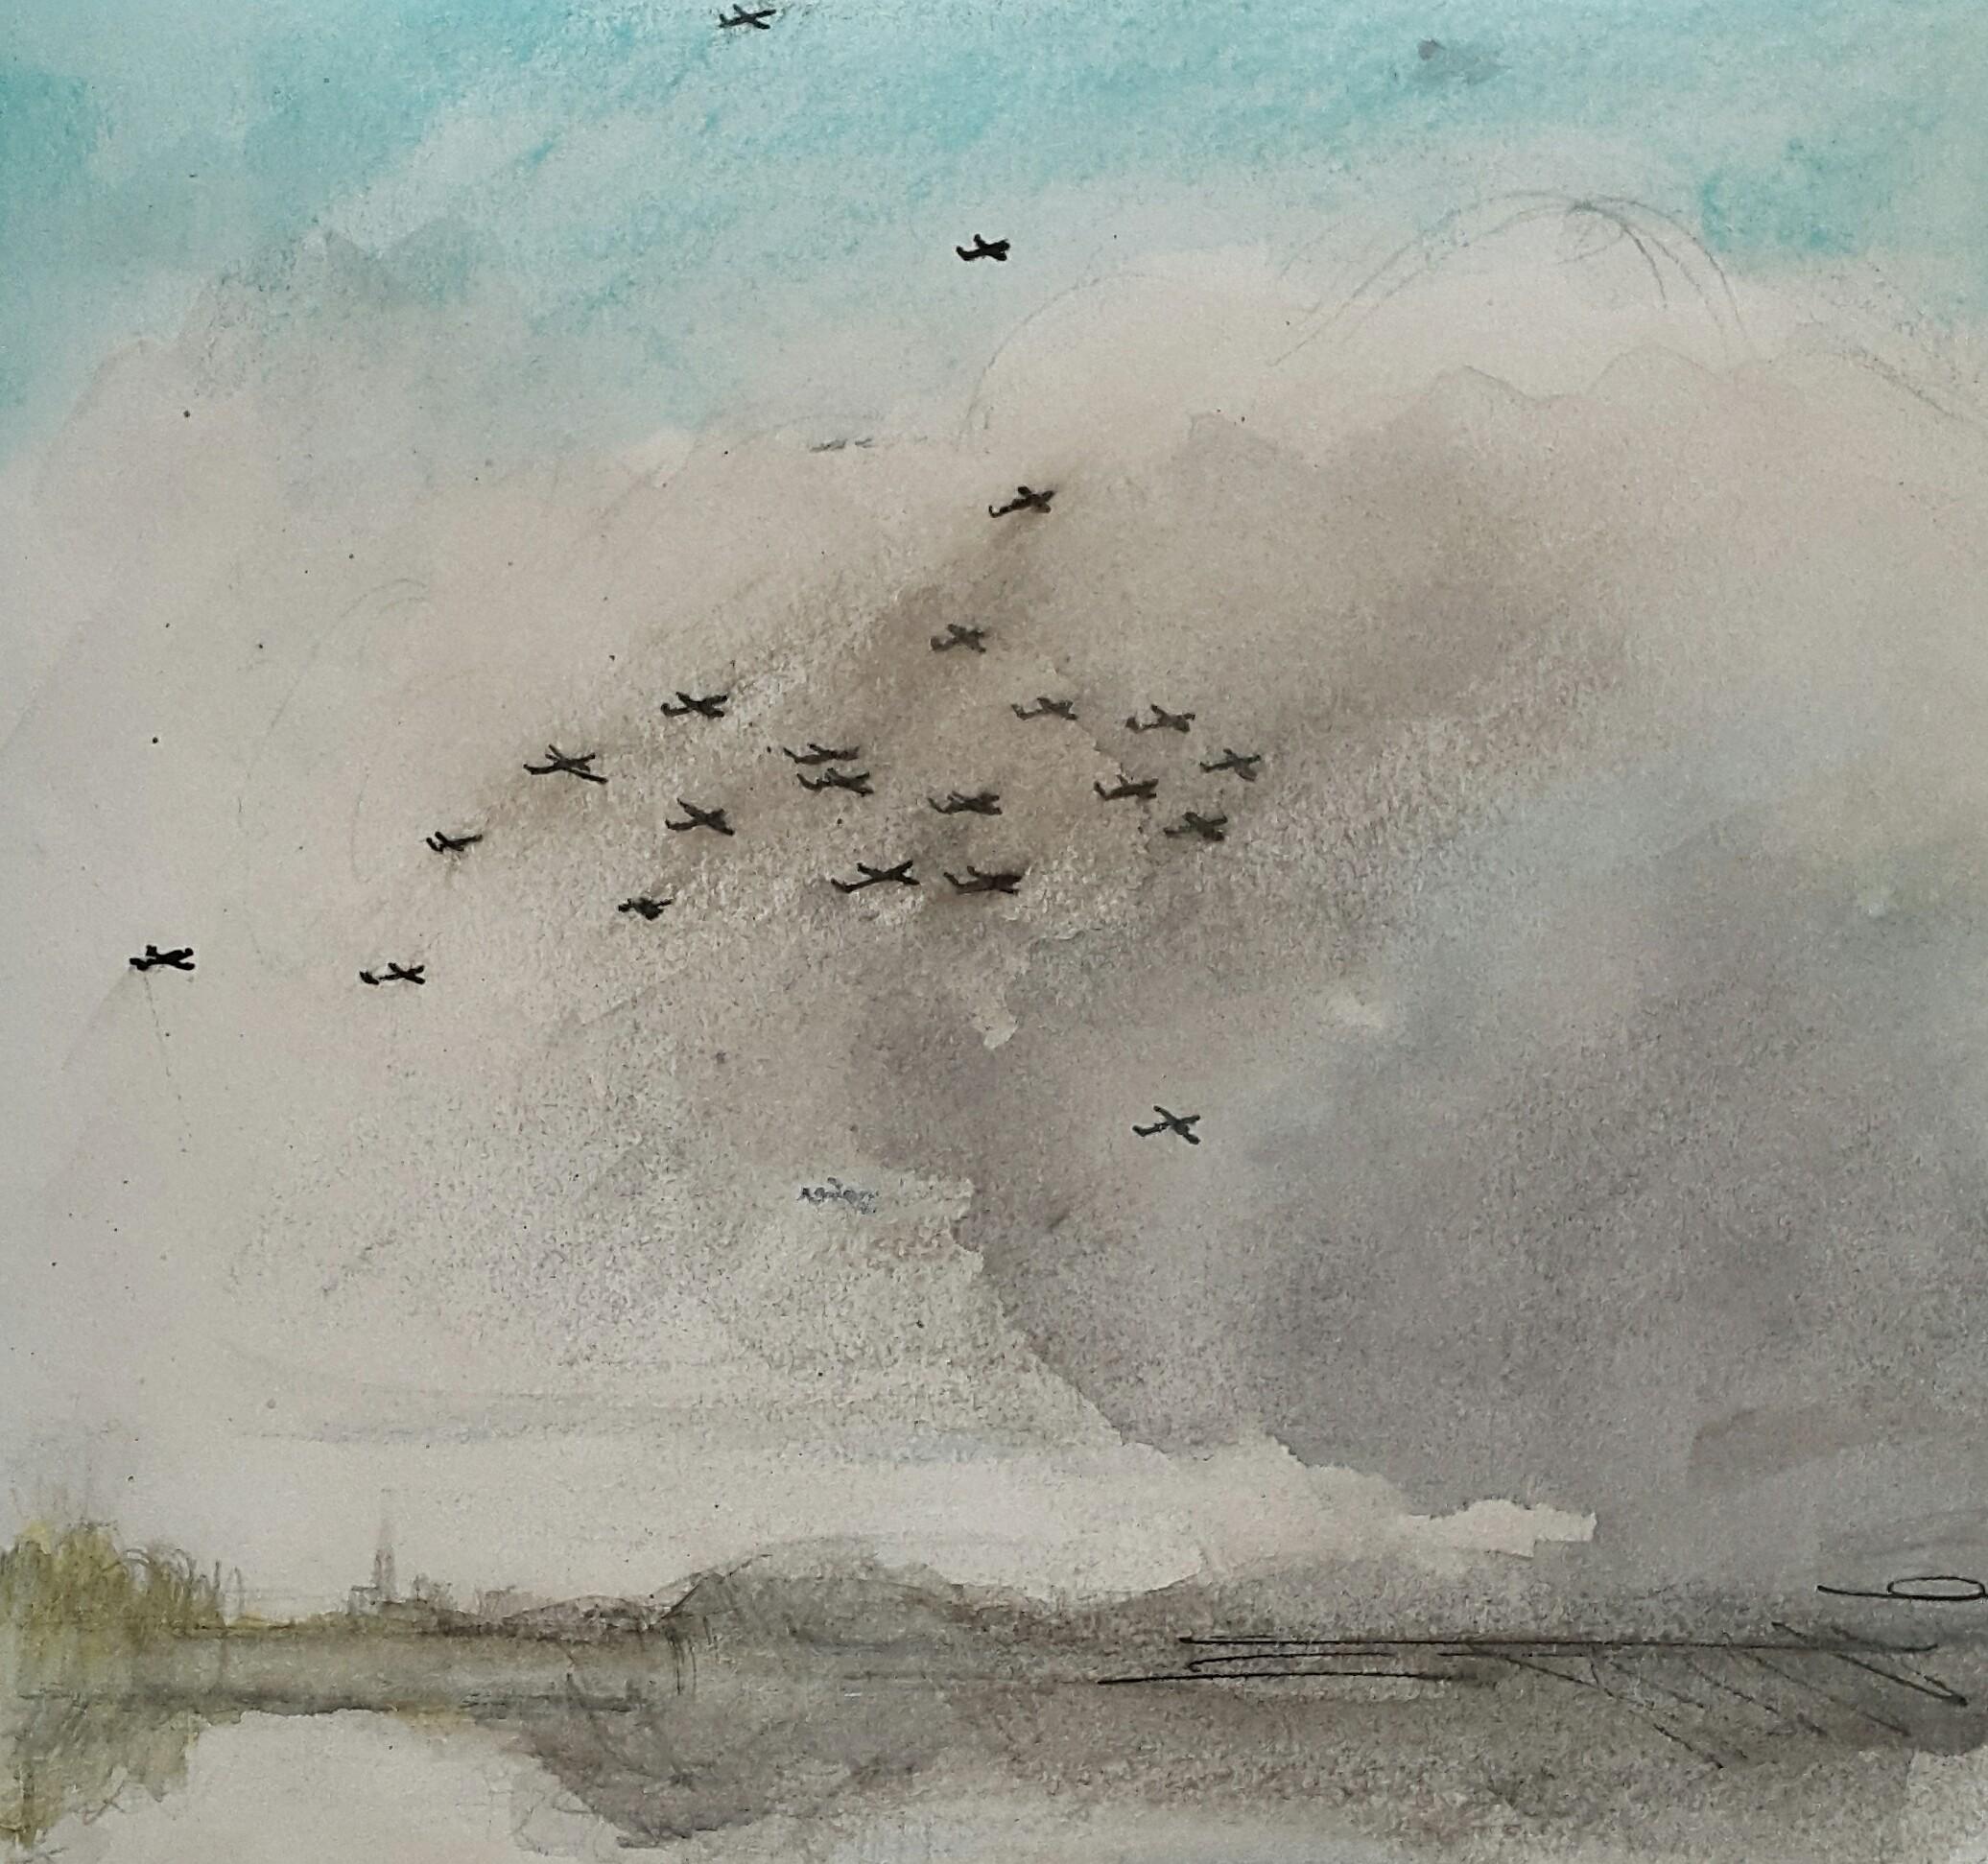 51 Adversity series,  Portent, 16x18cm, ink & watercolour on paper